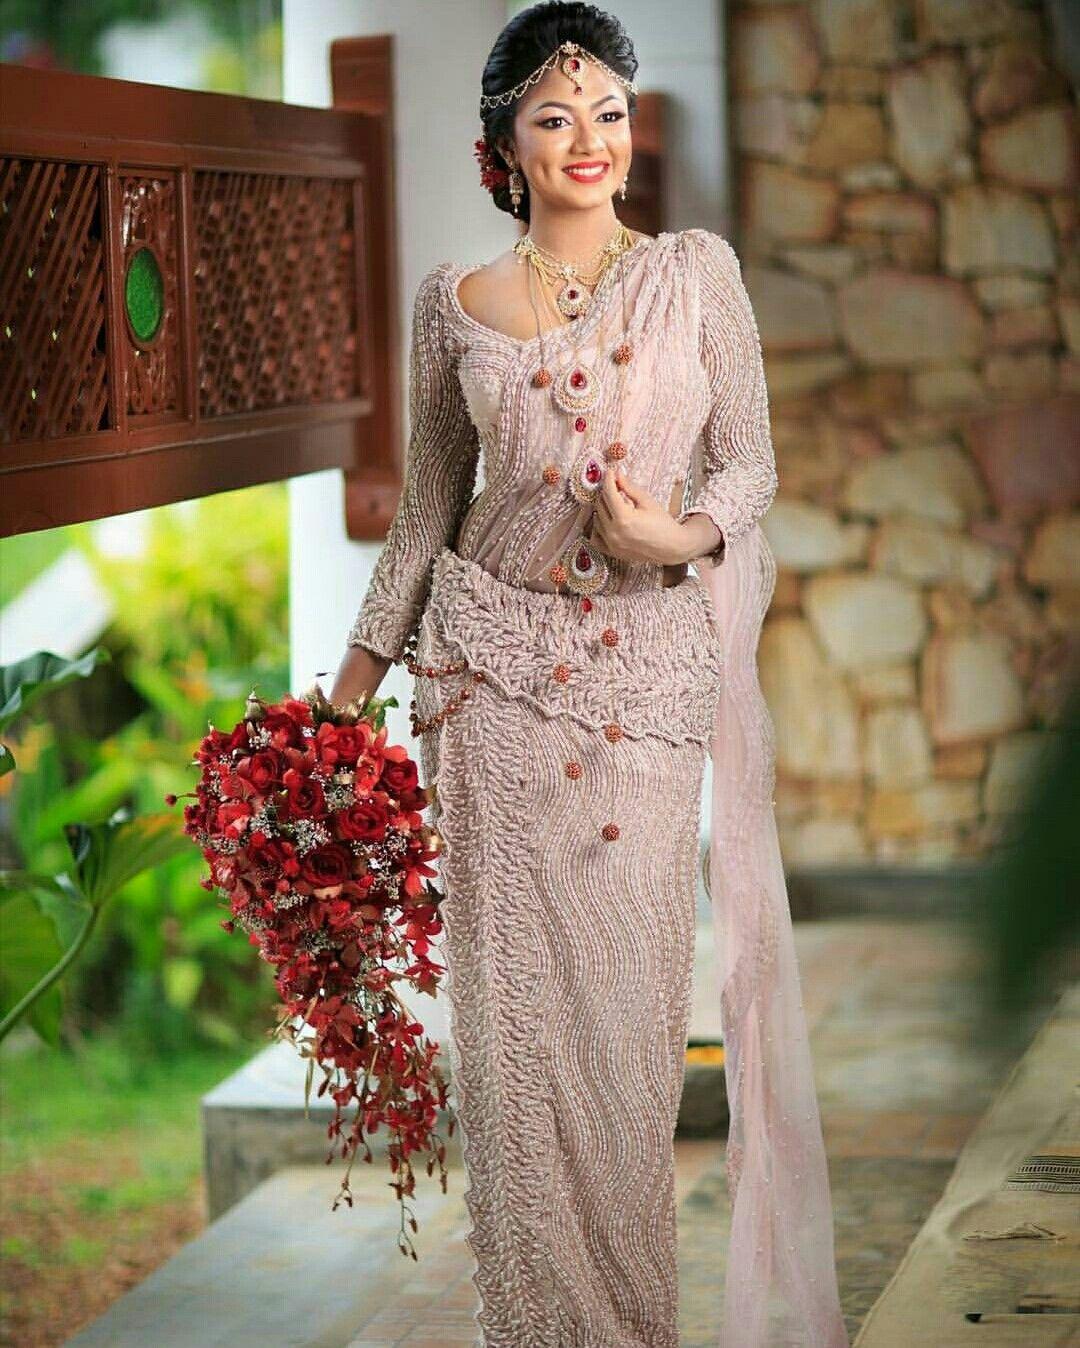 Pin By Yashodara R On Kandyan Brides India Wedding Dress Bridal Dress Design Bridal Dresses